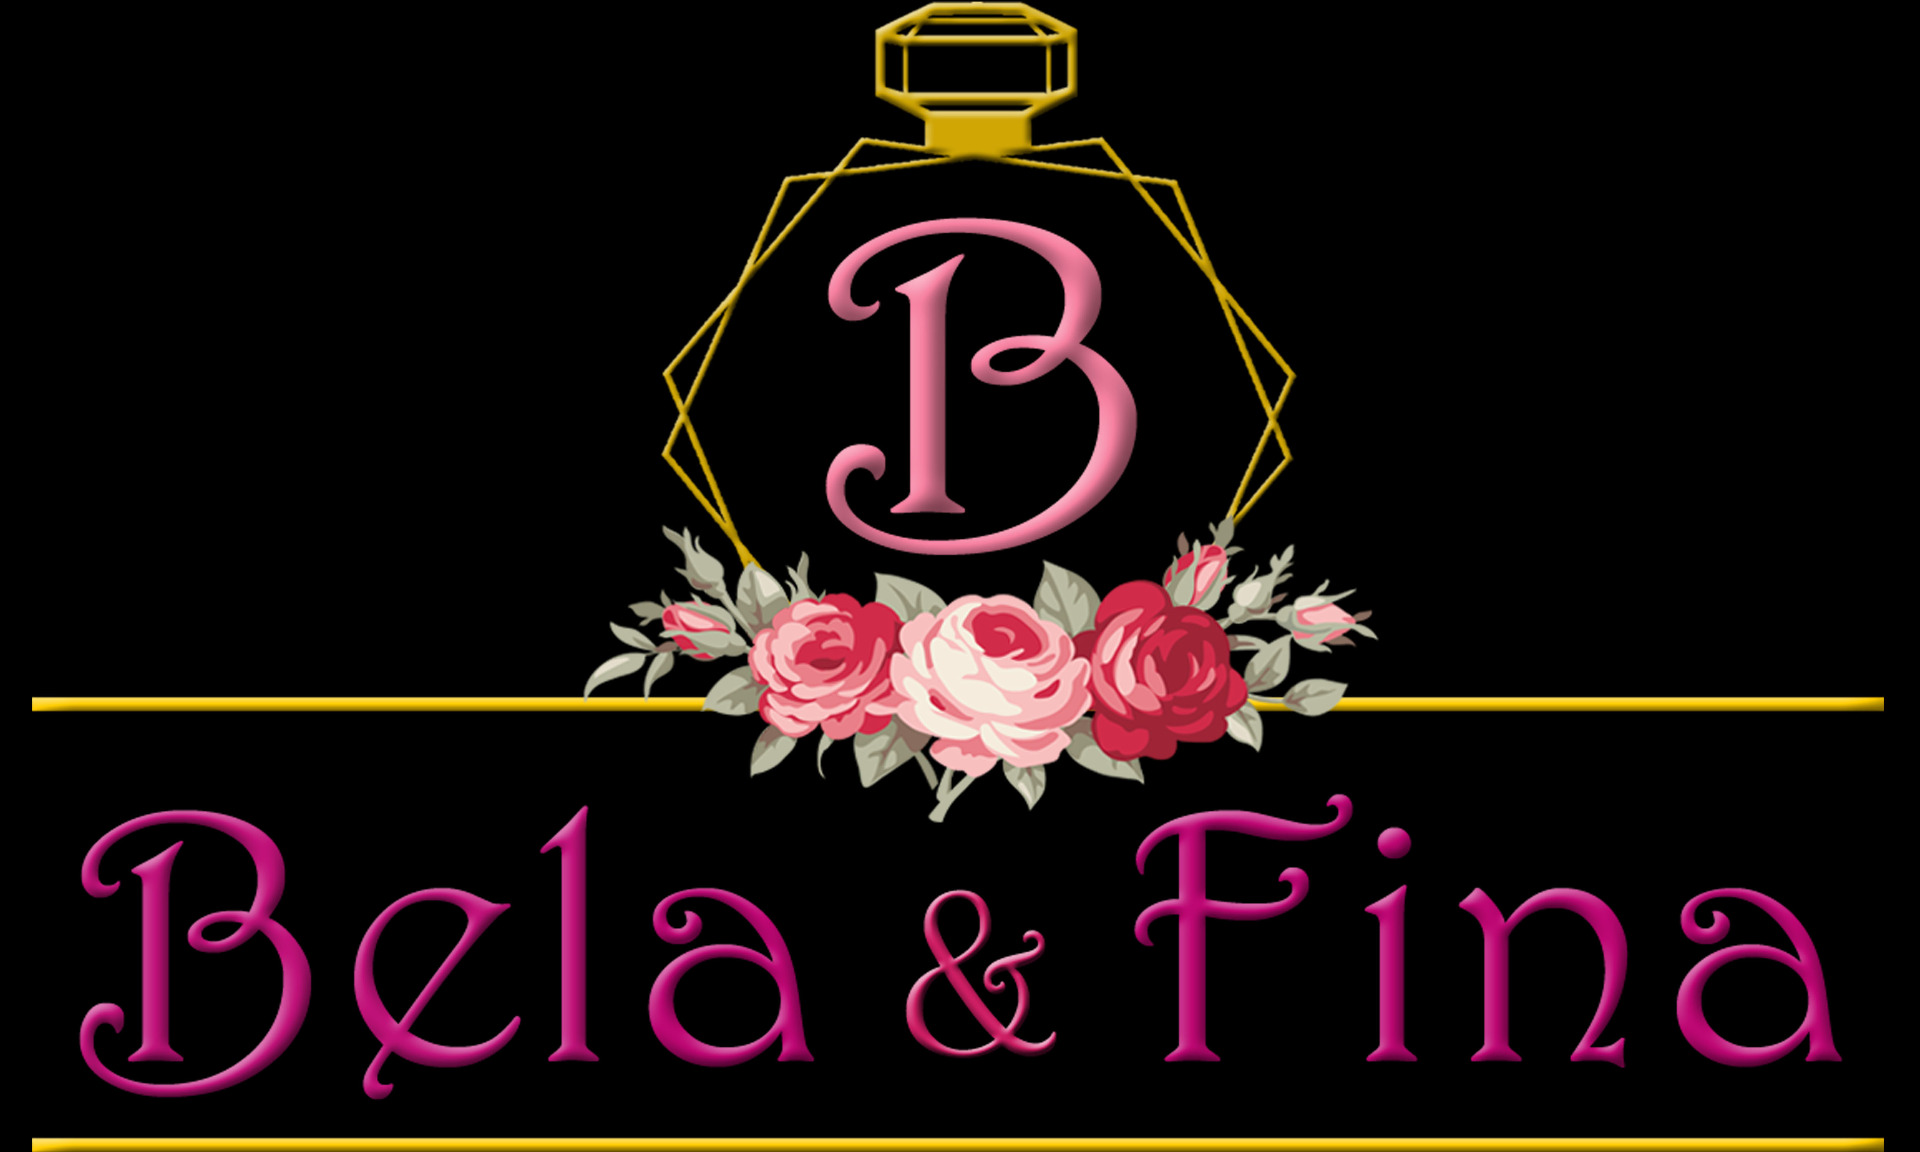 Bela e Fina | Perfumes Importados, Feminino e Masculino